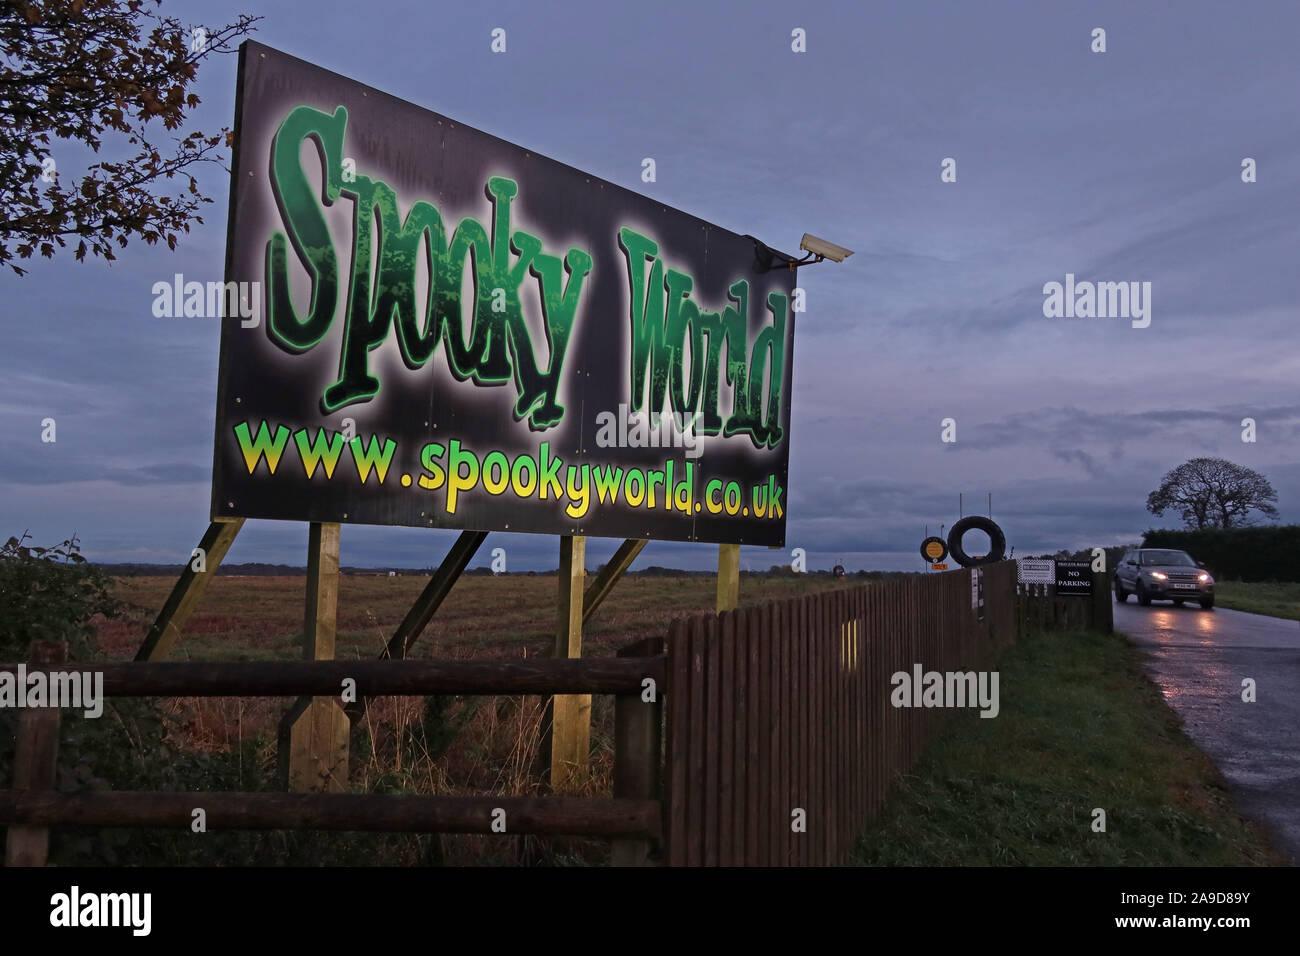 @HotpixUK,HotpixUK,GoTonySmith,Blue Hour,Village,night,nighttime,night time,England,UK,North West England,WA4 4NW,farmers,diversifying,NFU,Adventure Farm,Spooky World Apple Jacks Farm,Tourist Attraction,Stretton Road,sign,kids day out,Apple Jacks Adventure Farm,The More the Merrier,tickets,play areas,heating,Jacks ball blast,Farm Fun Ltd,Spooky-at-Night,maze,mazes,Cheshire Tourist Attractions